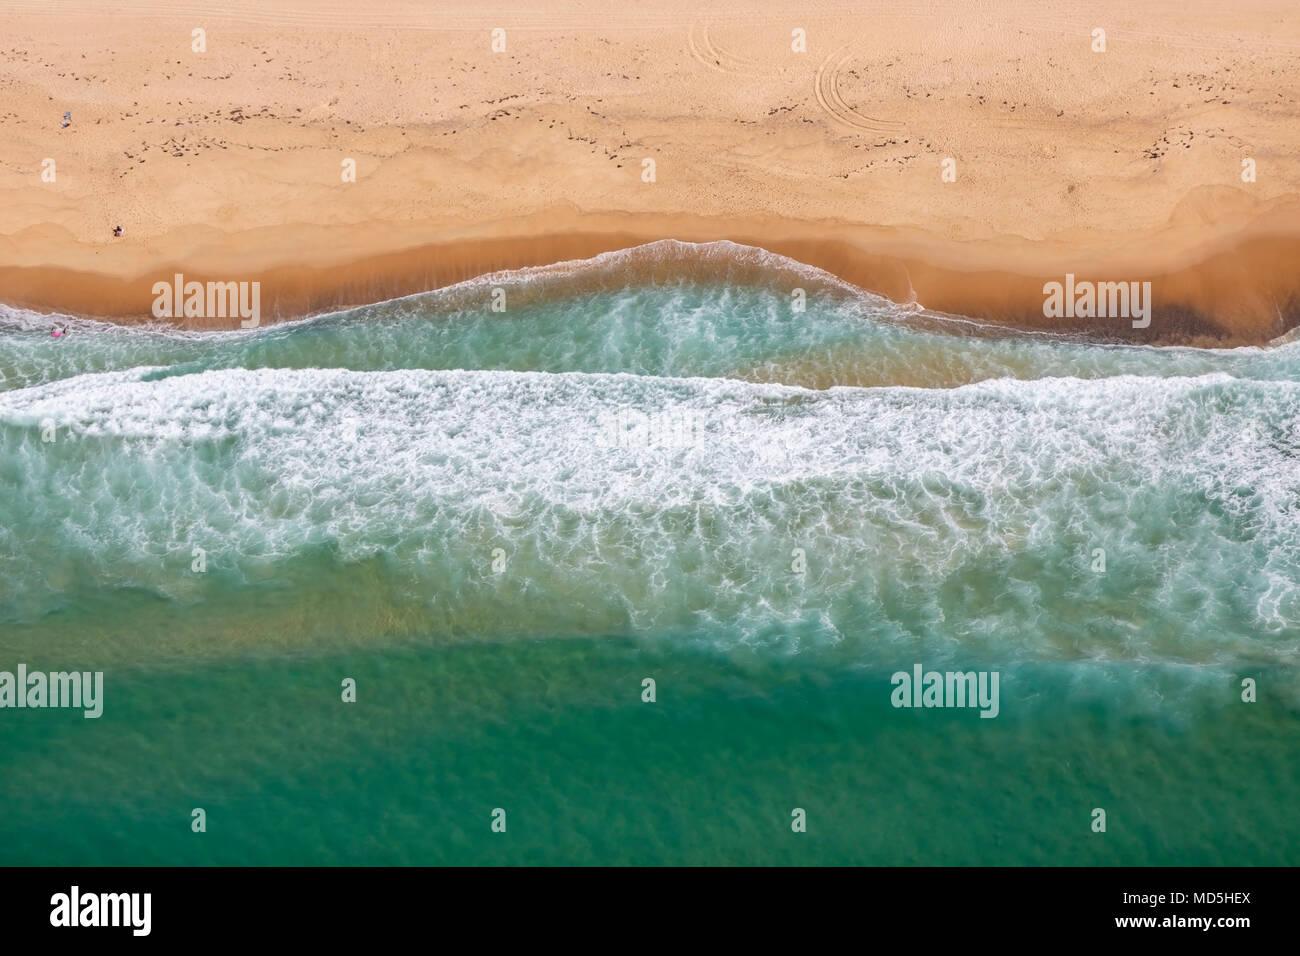 Abstrakte Luftaufnahmen von 9 Mile Beach, Lake Macquarie, NSW, Australien Stockfoto